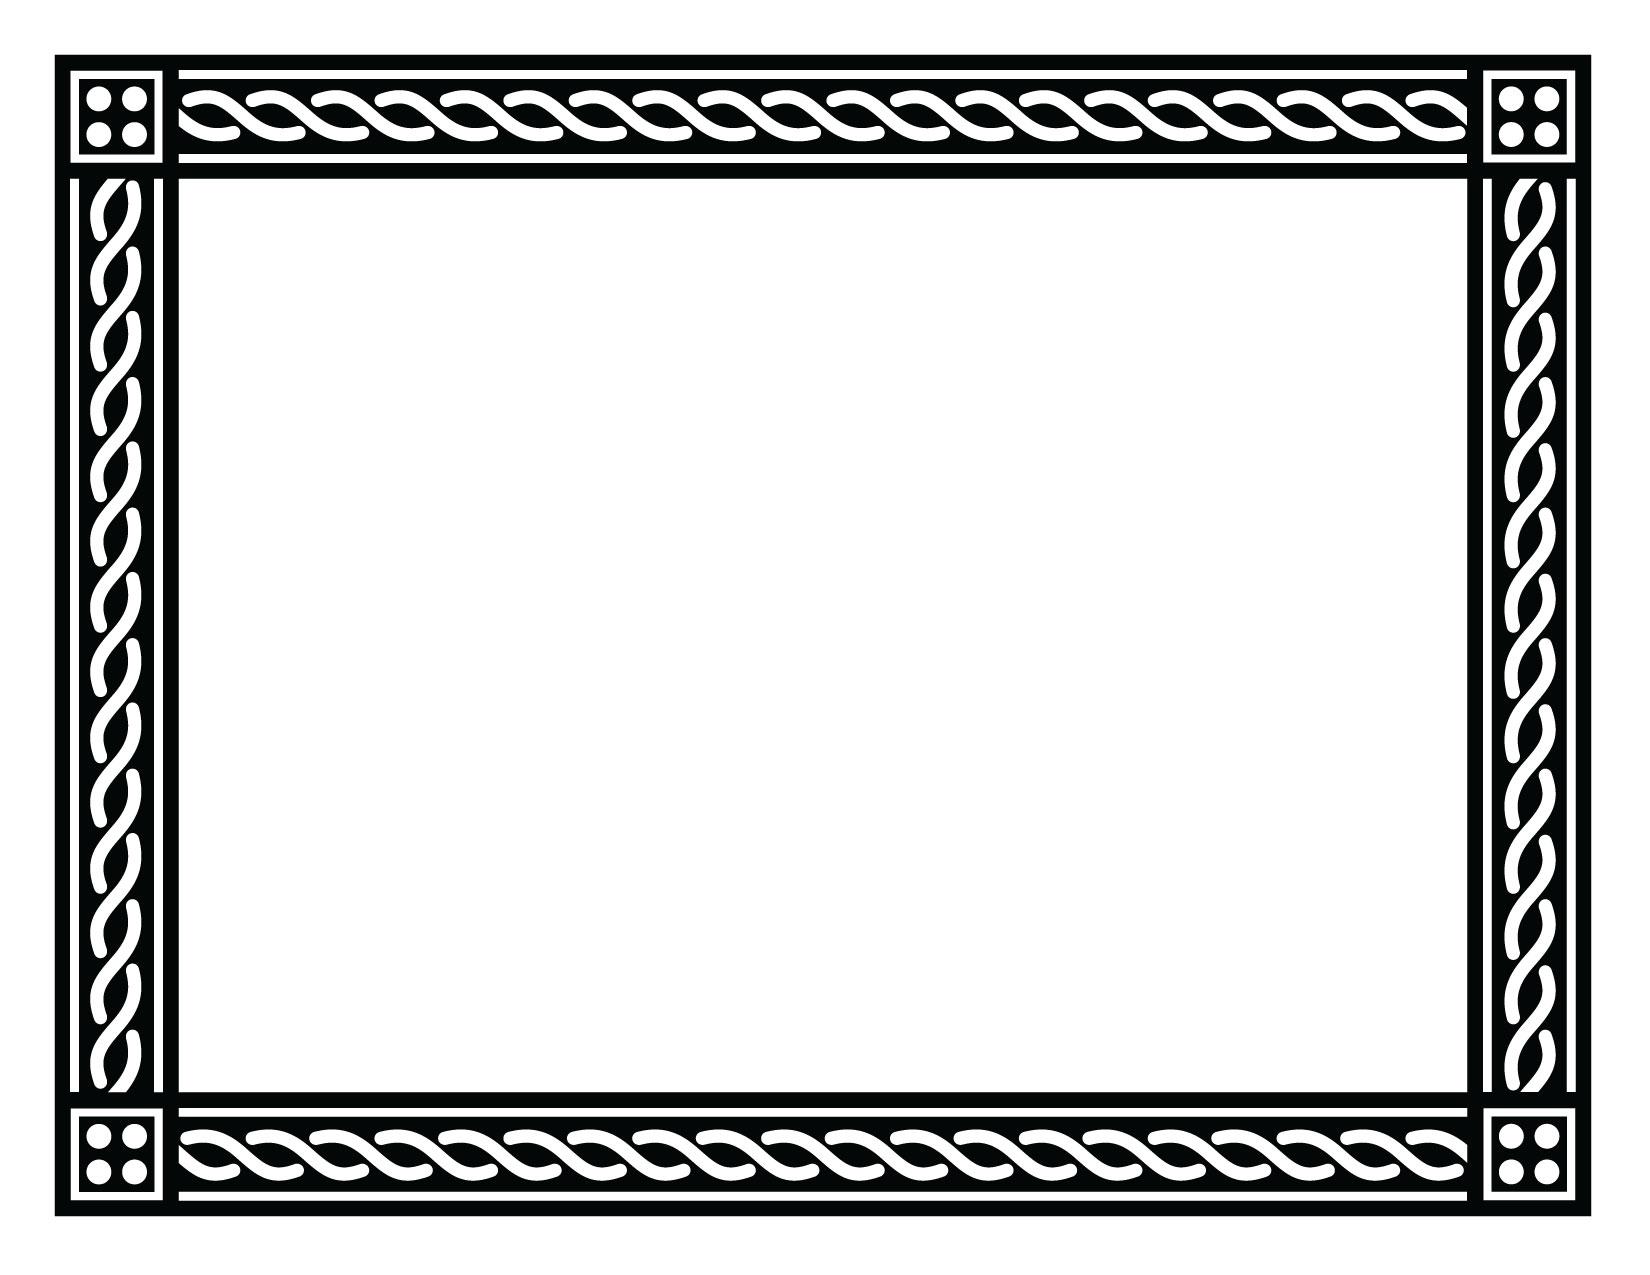 Free Blank Certificate Borders